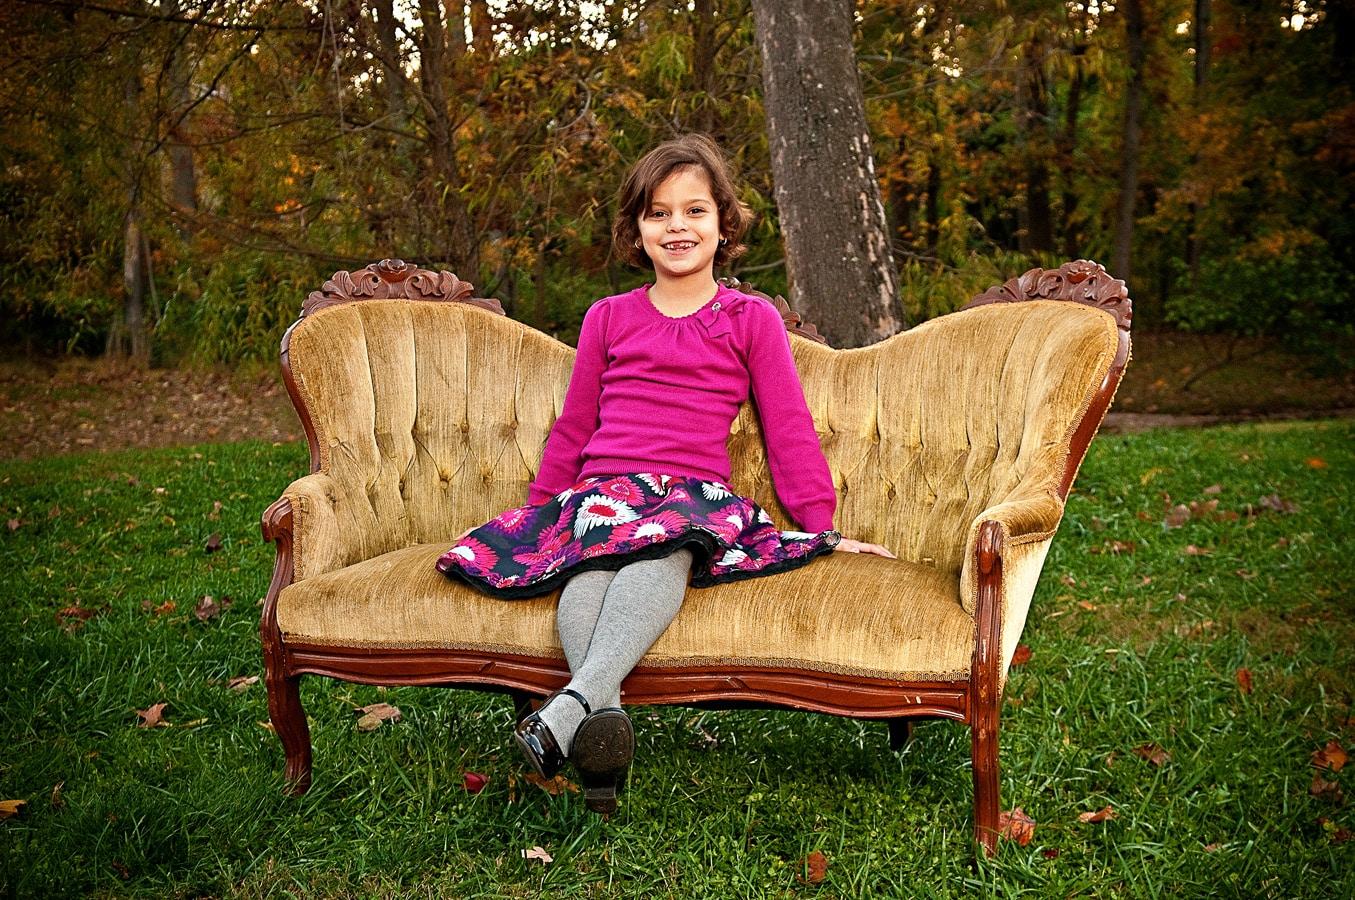 child, portrait, outdoor, sofa, natural light, Northern VA